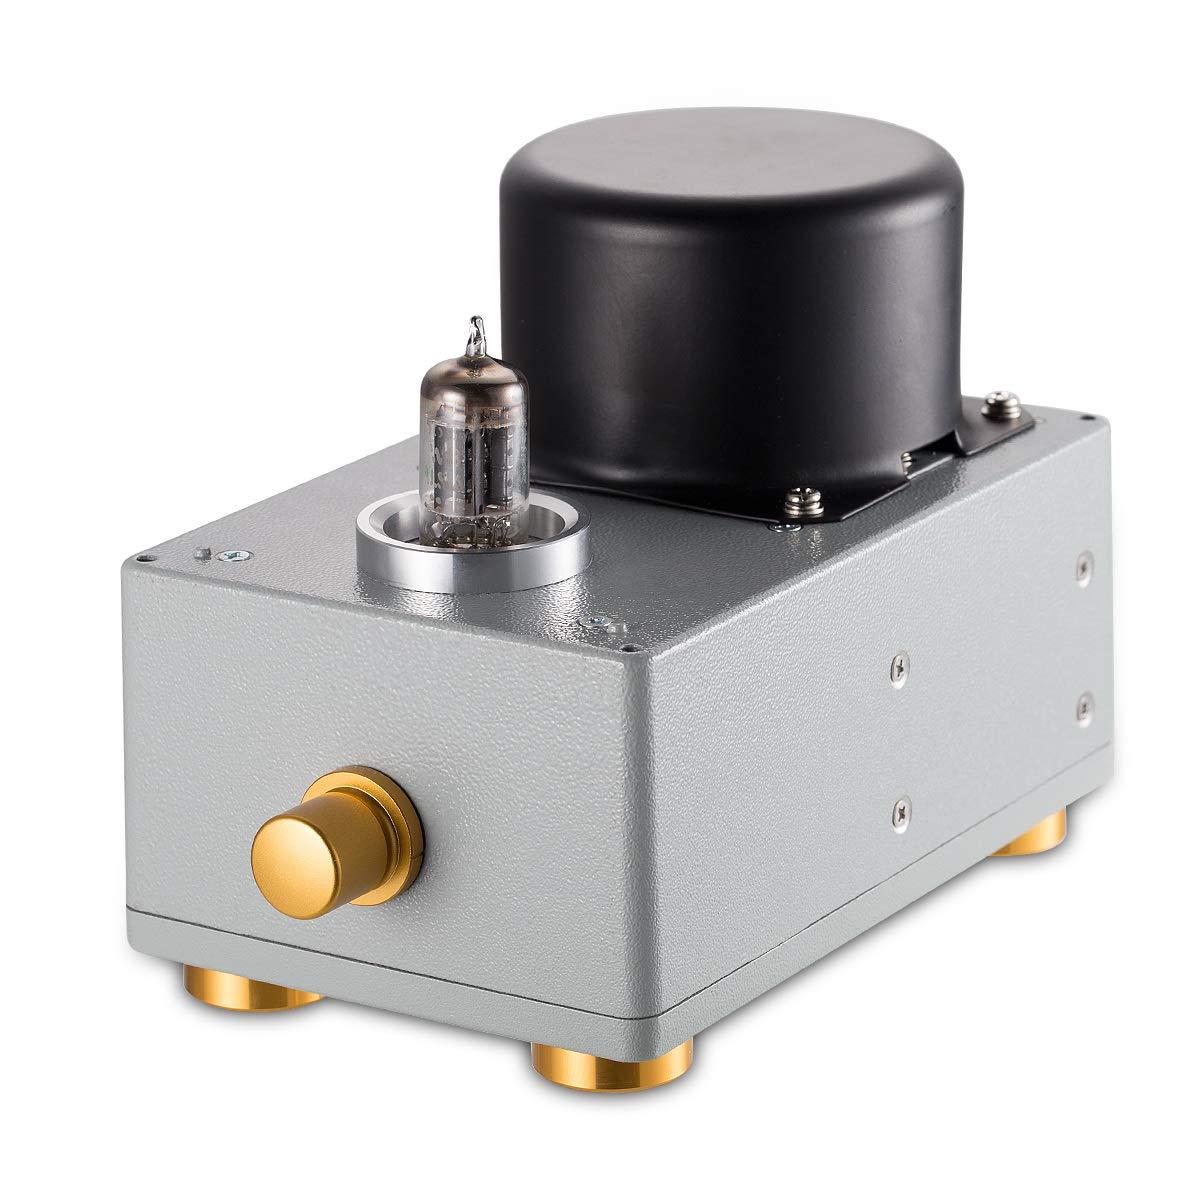 HiFi ステレオ シングル 真空管 5687 プリアンプ Audio Note M7に触発   B07MD8N4YG